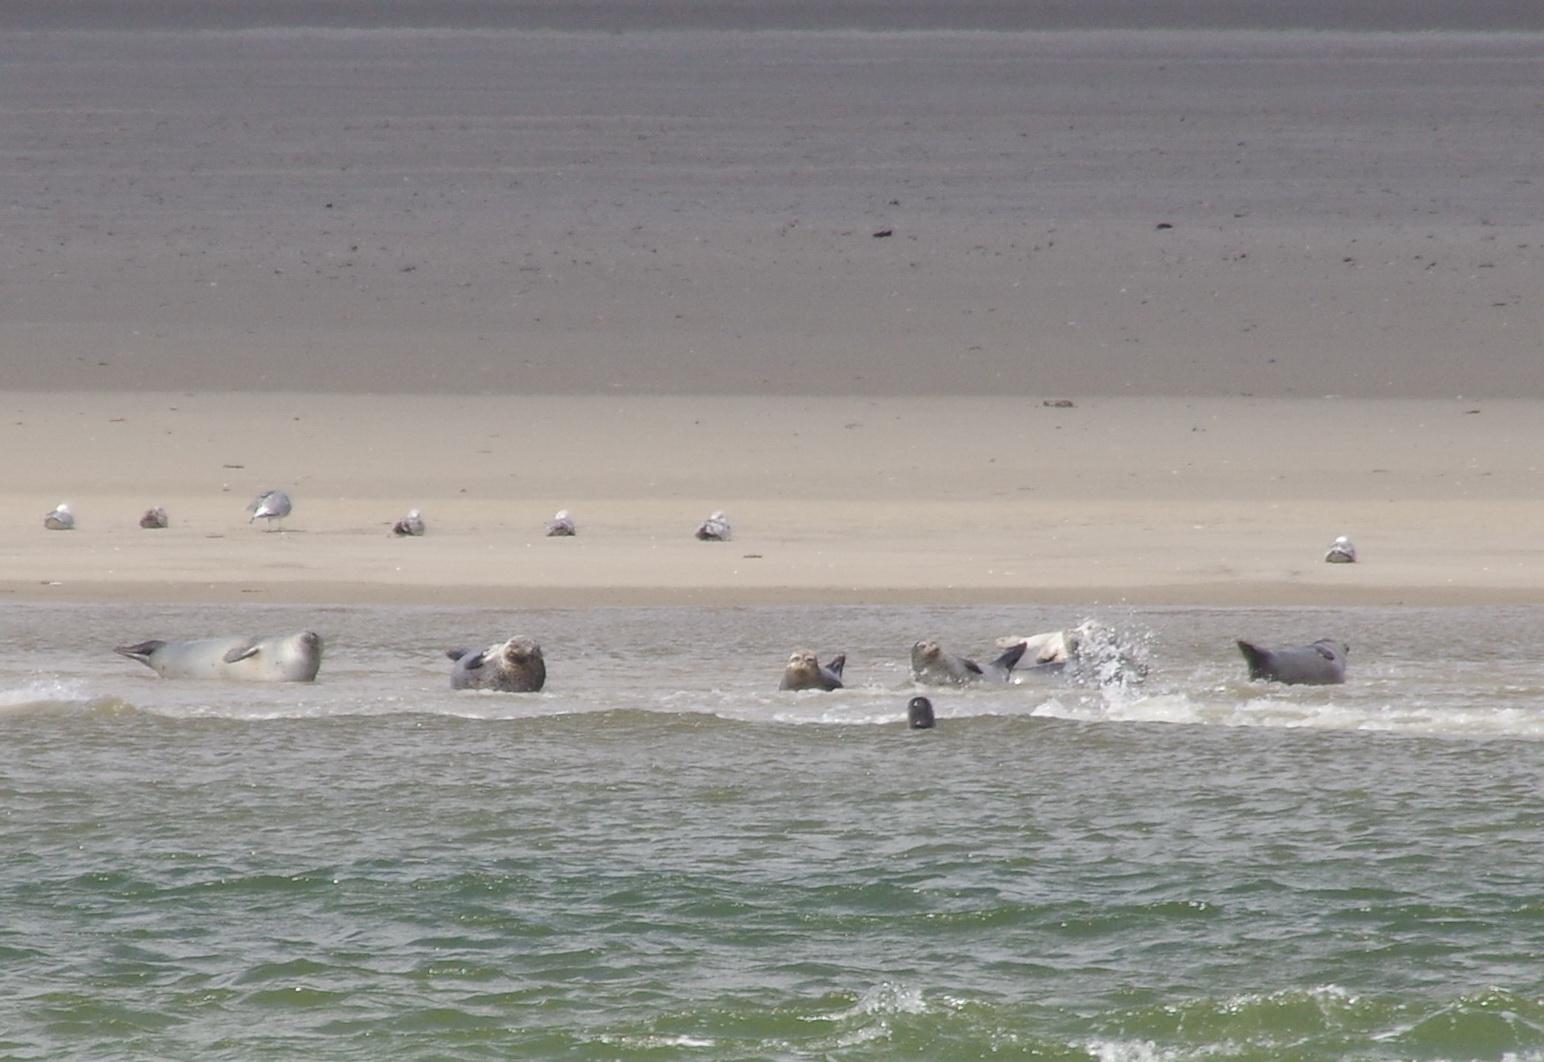 Texel - Schifffahrt Texel 44 TH Seehunde